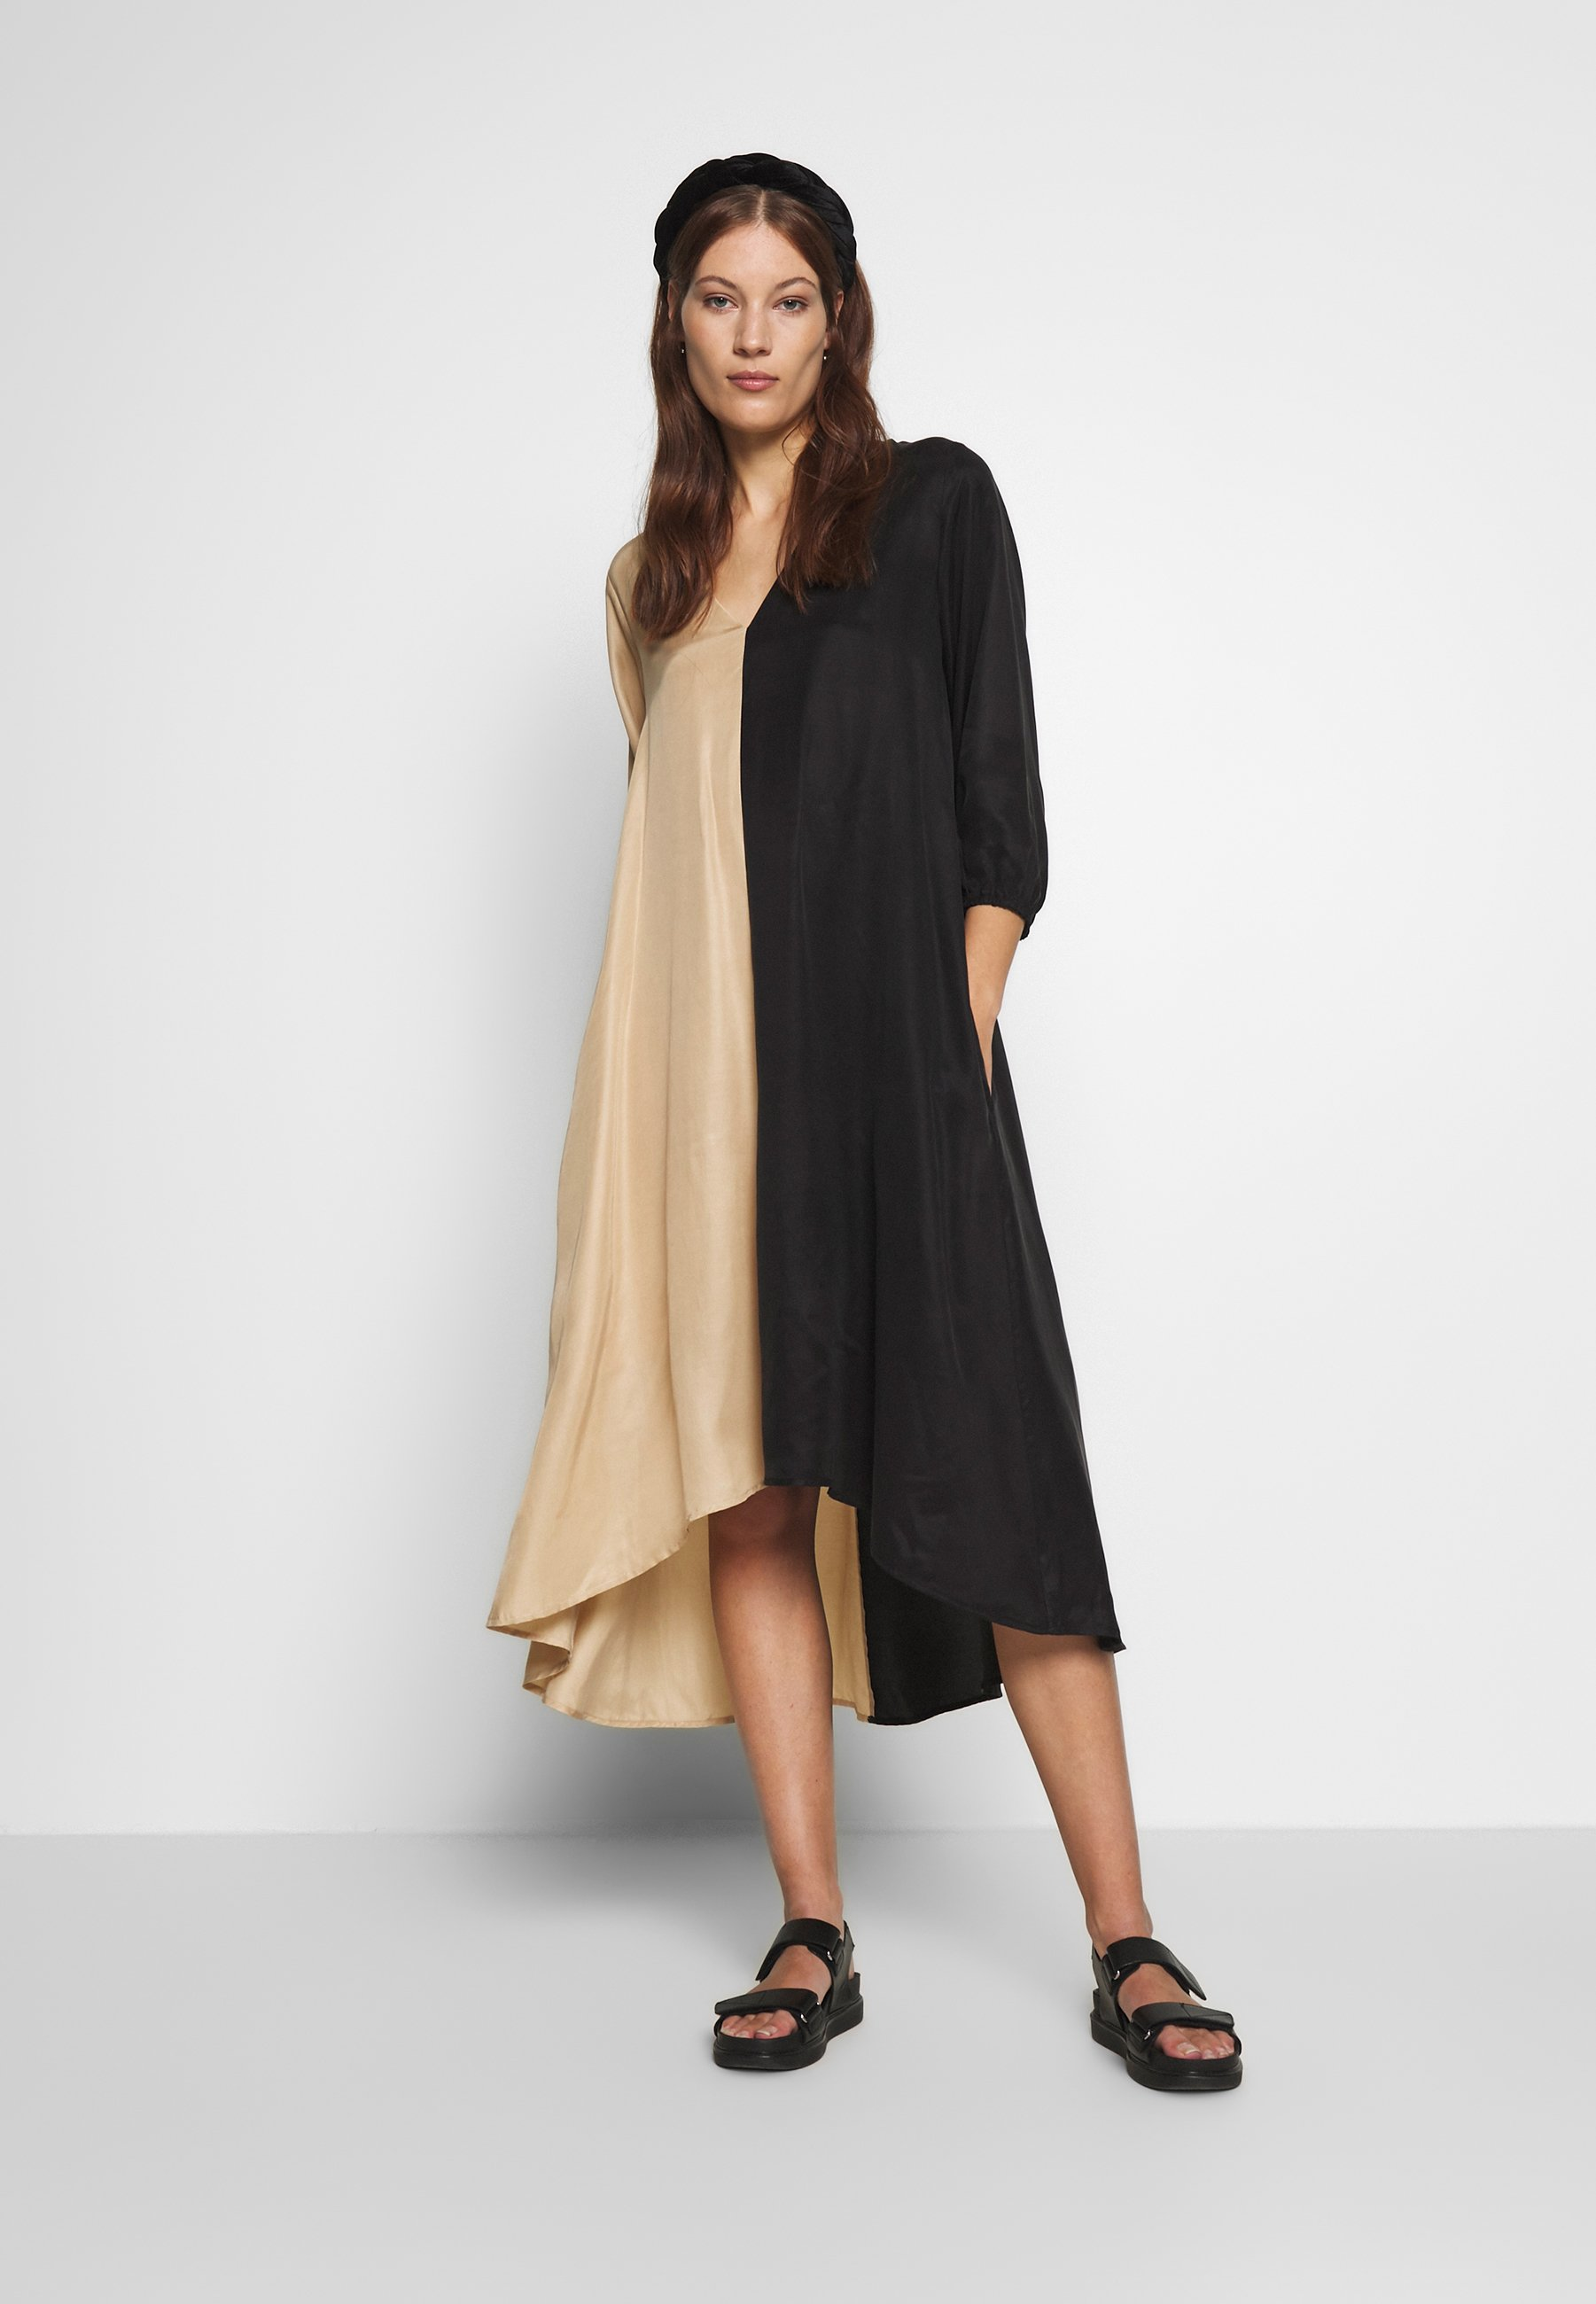 Gestuz Lorah Dress - Vestito Estivo Black VrPKTsB